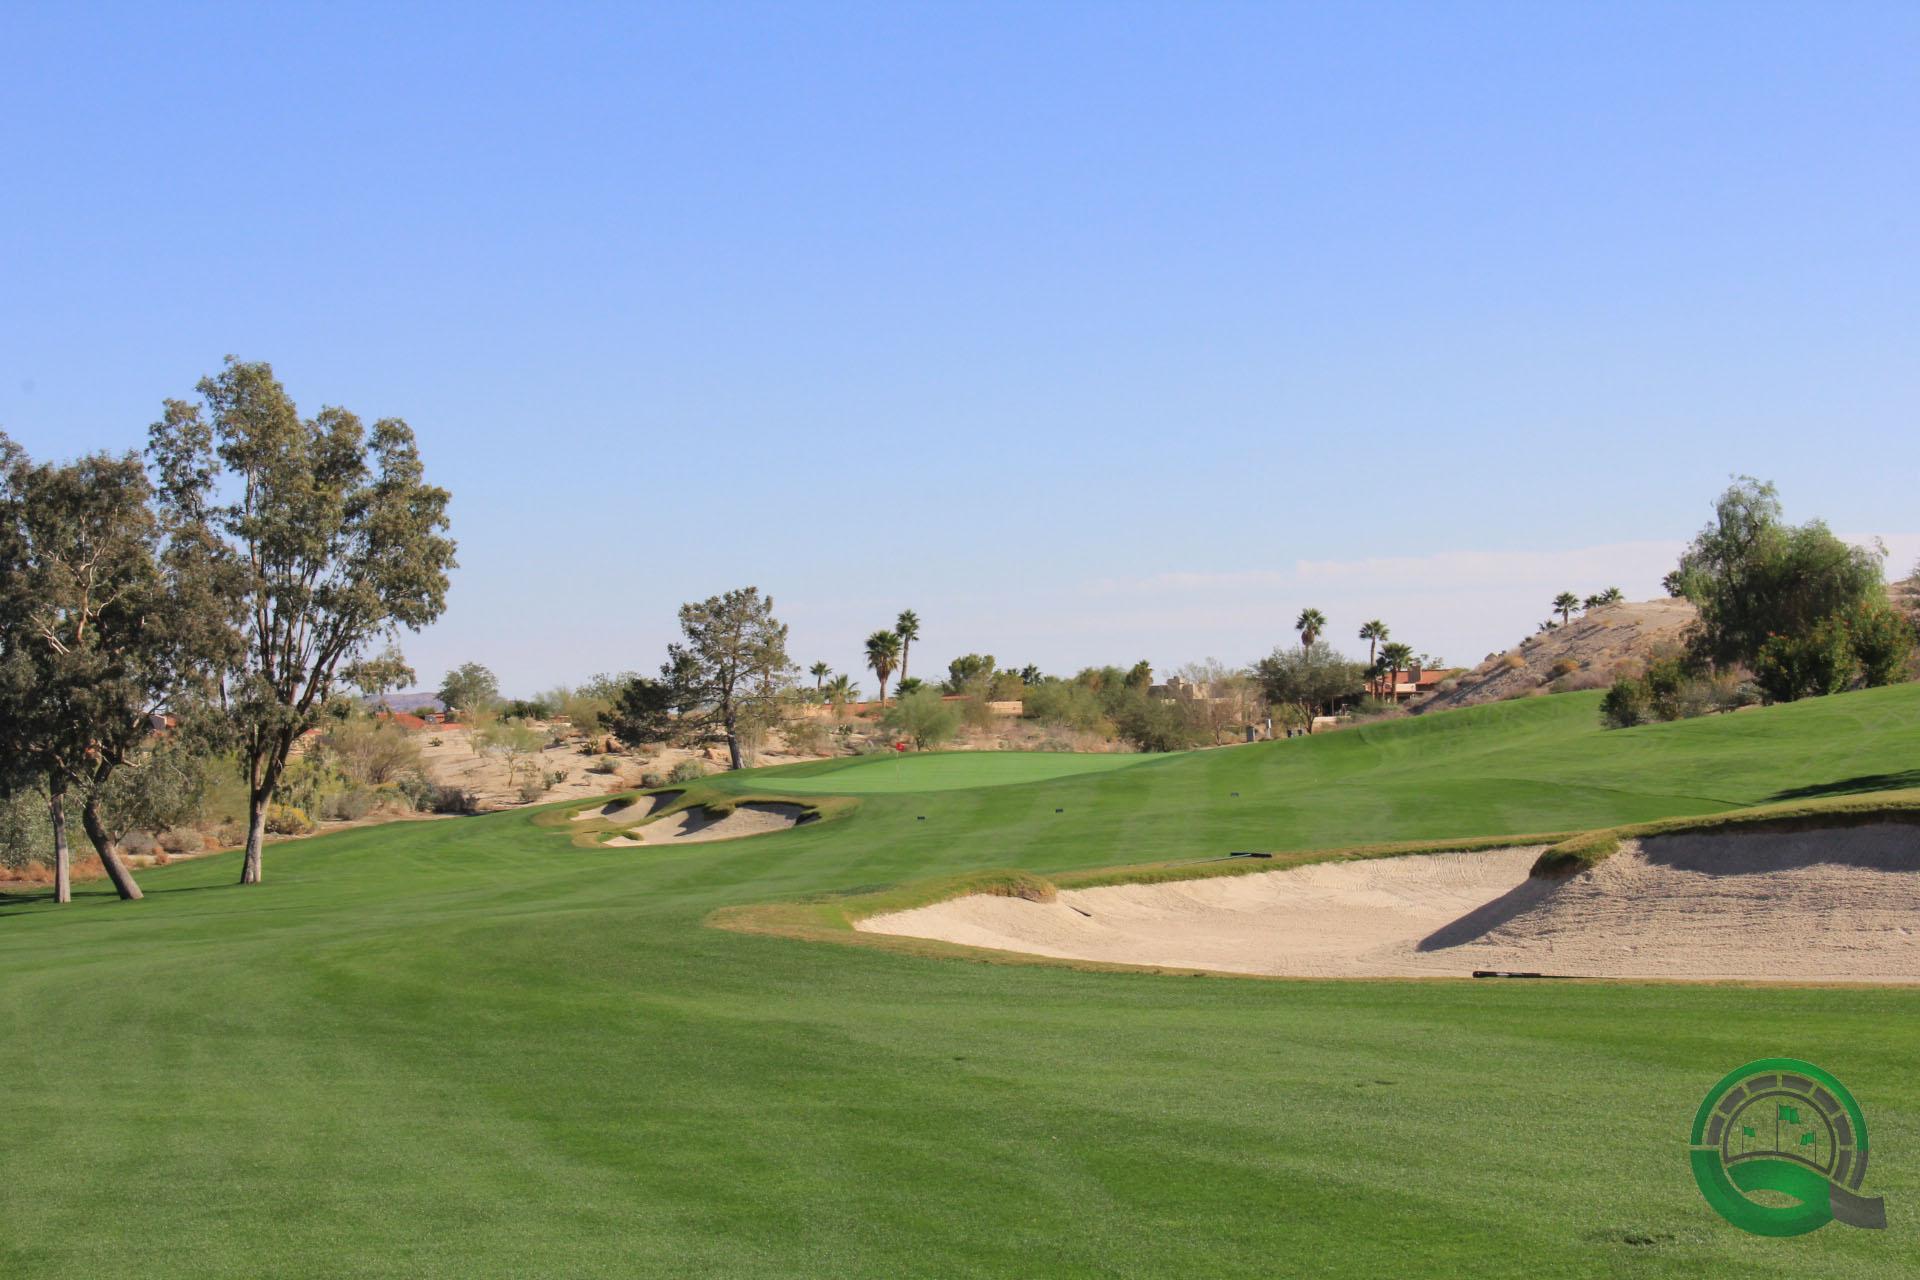 Rams Hill Golf Club Hole 3 Fairway Bunker